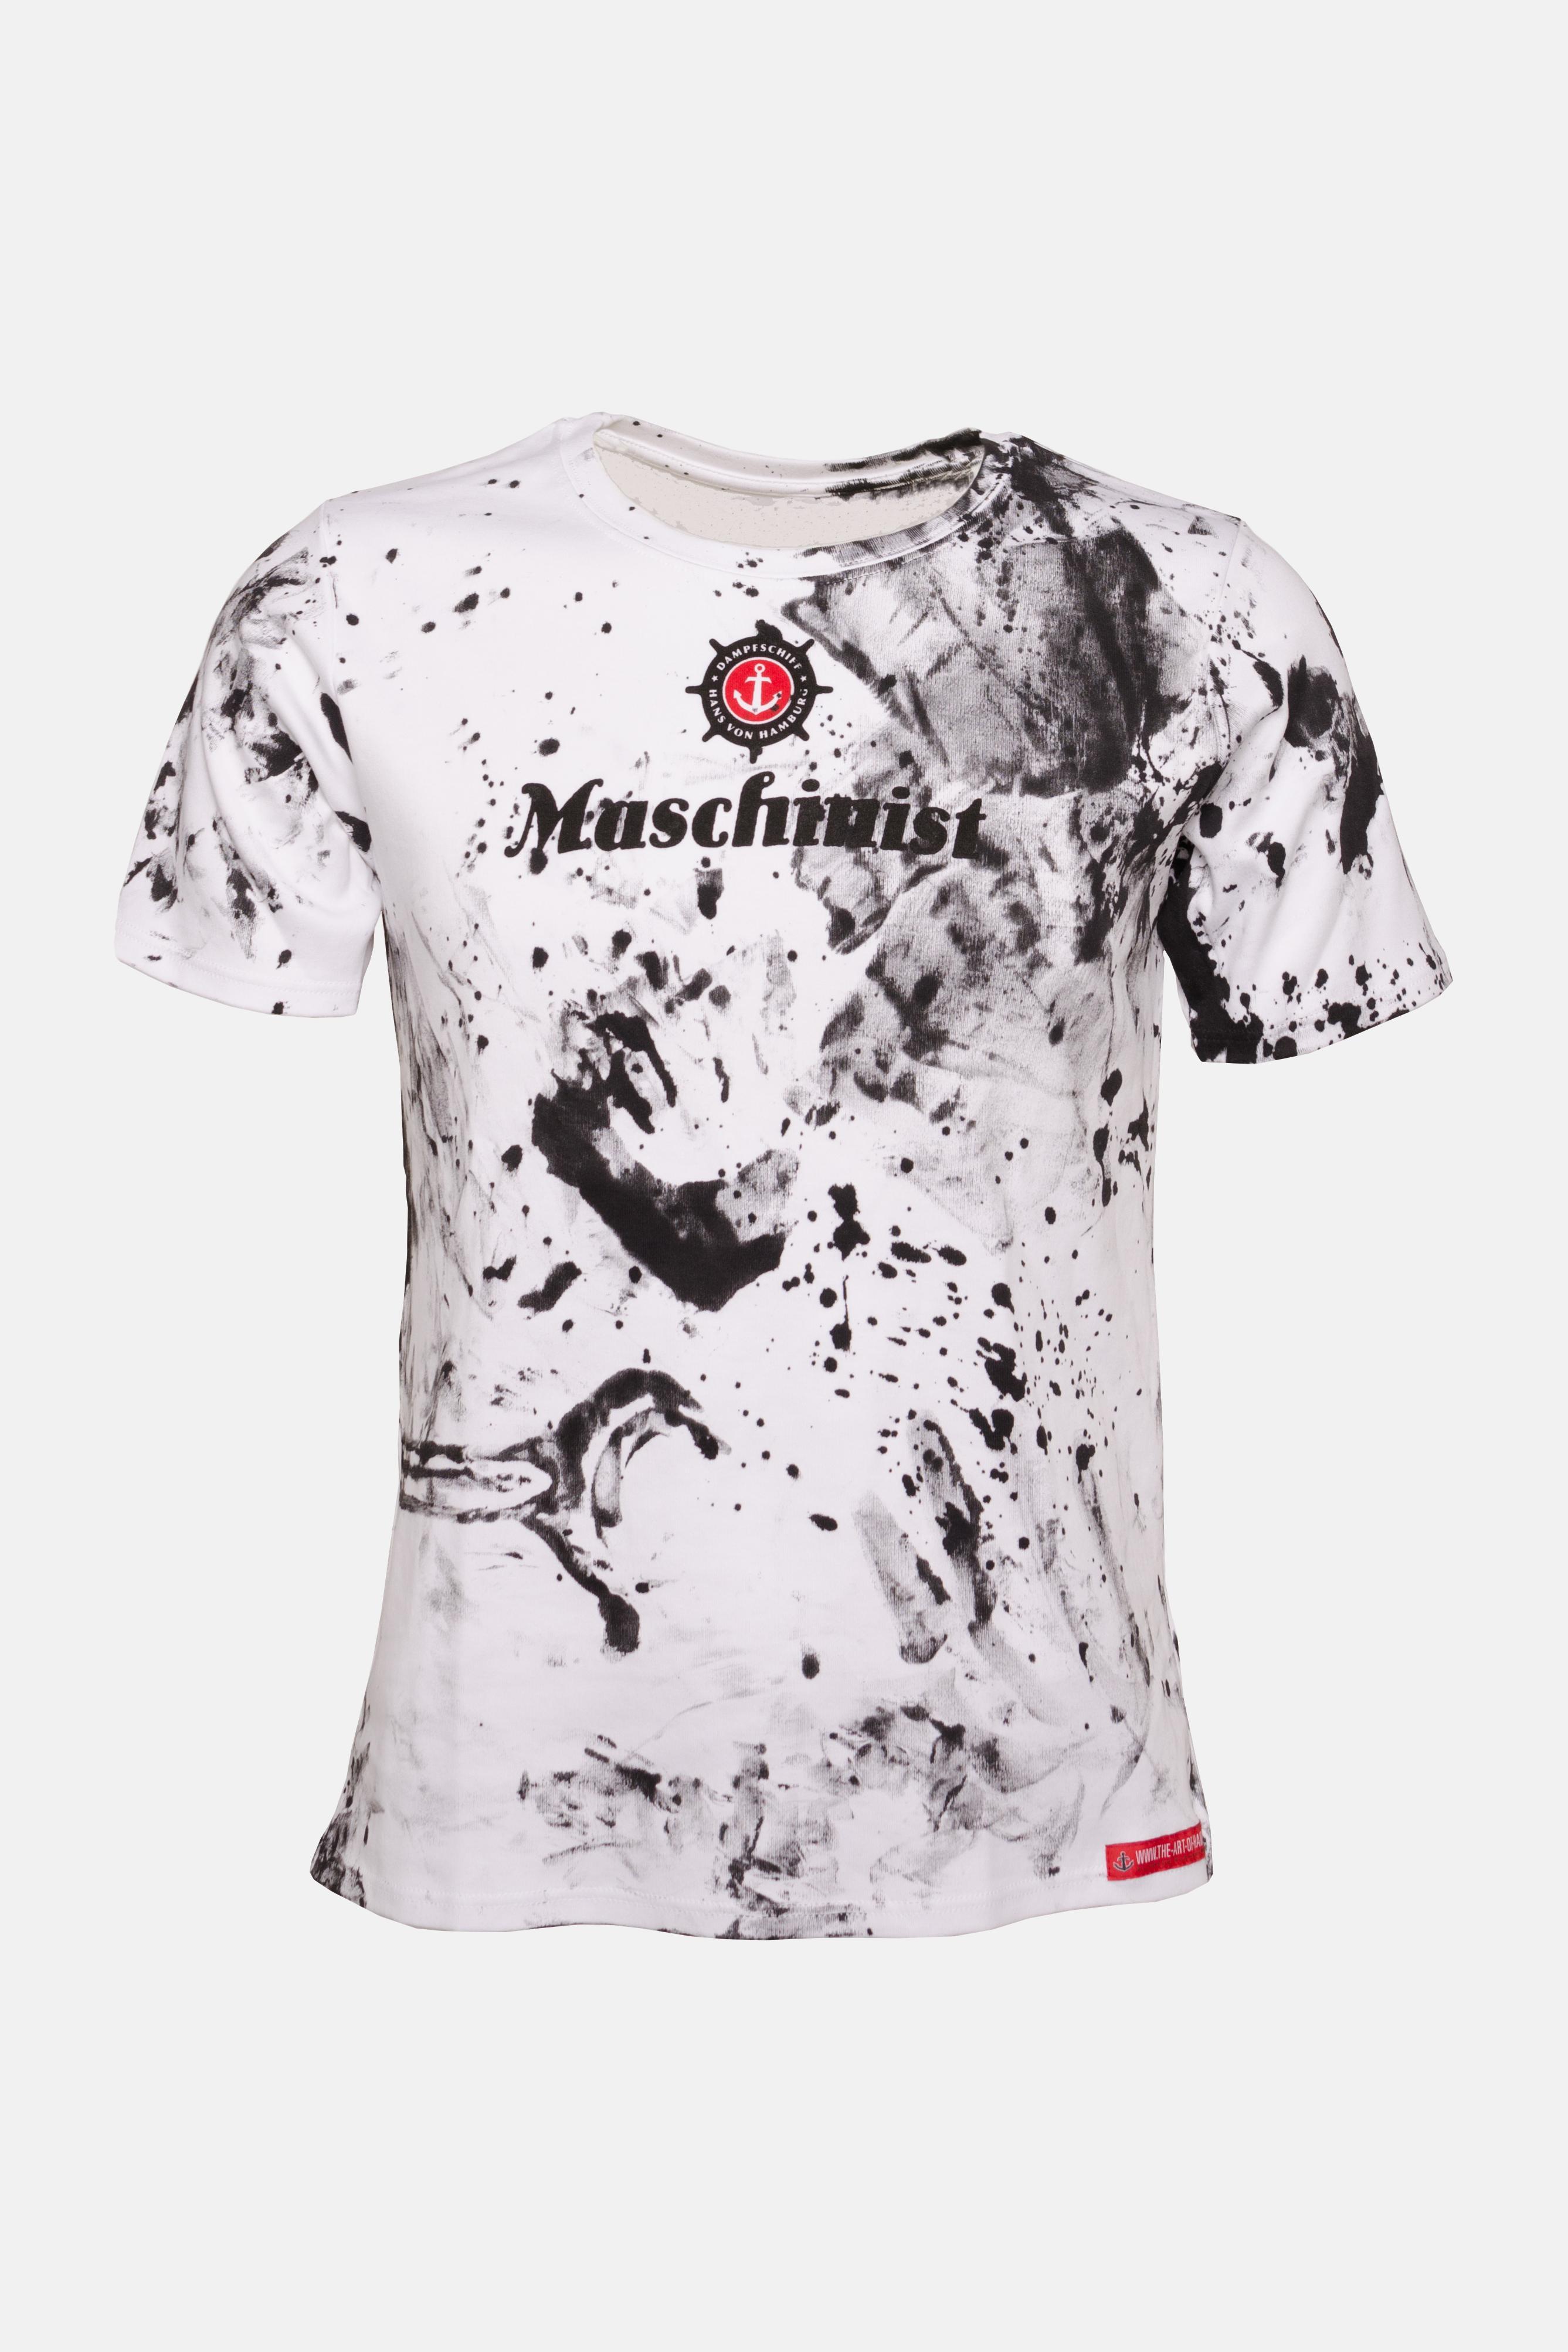 dfa18e85388e97 Maschinist T-Shirt | Hanseheld.de